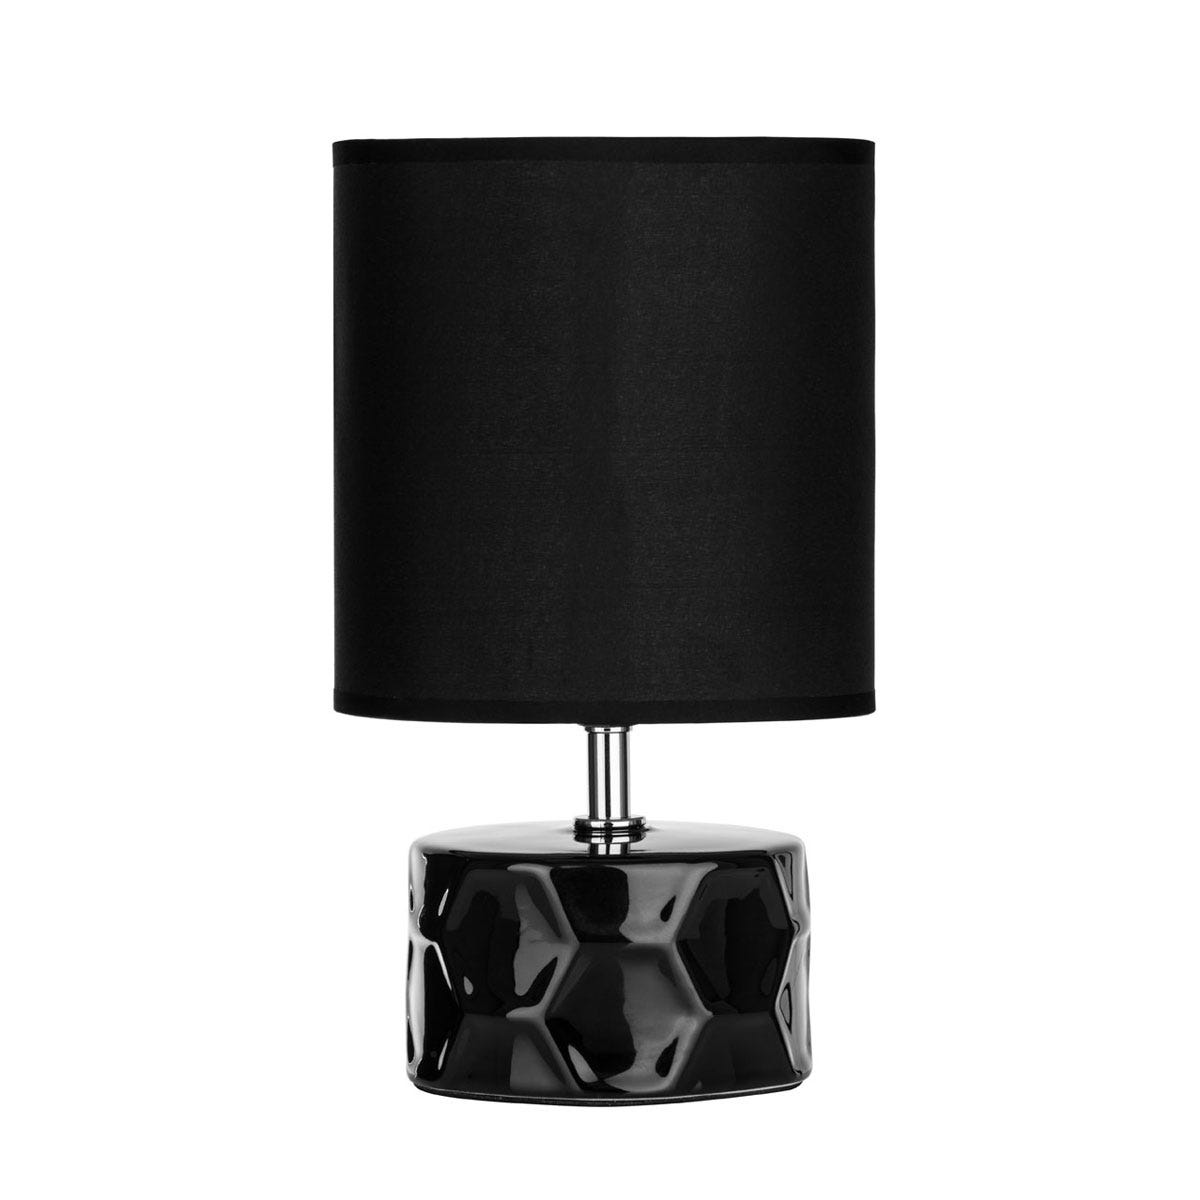 Premier Housewares Honeycomb Ceramic Base Table Lamp - Black